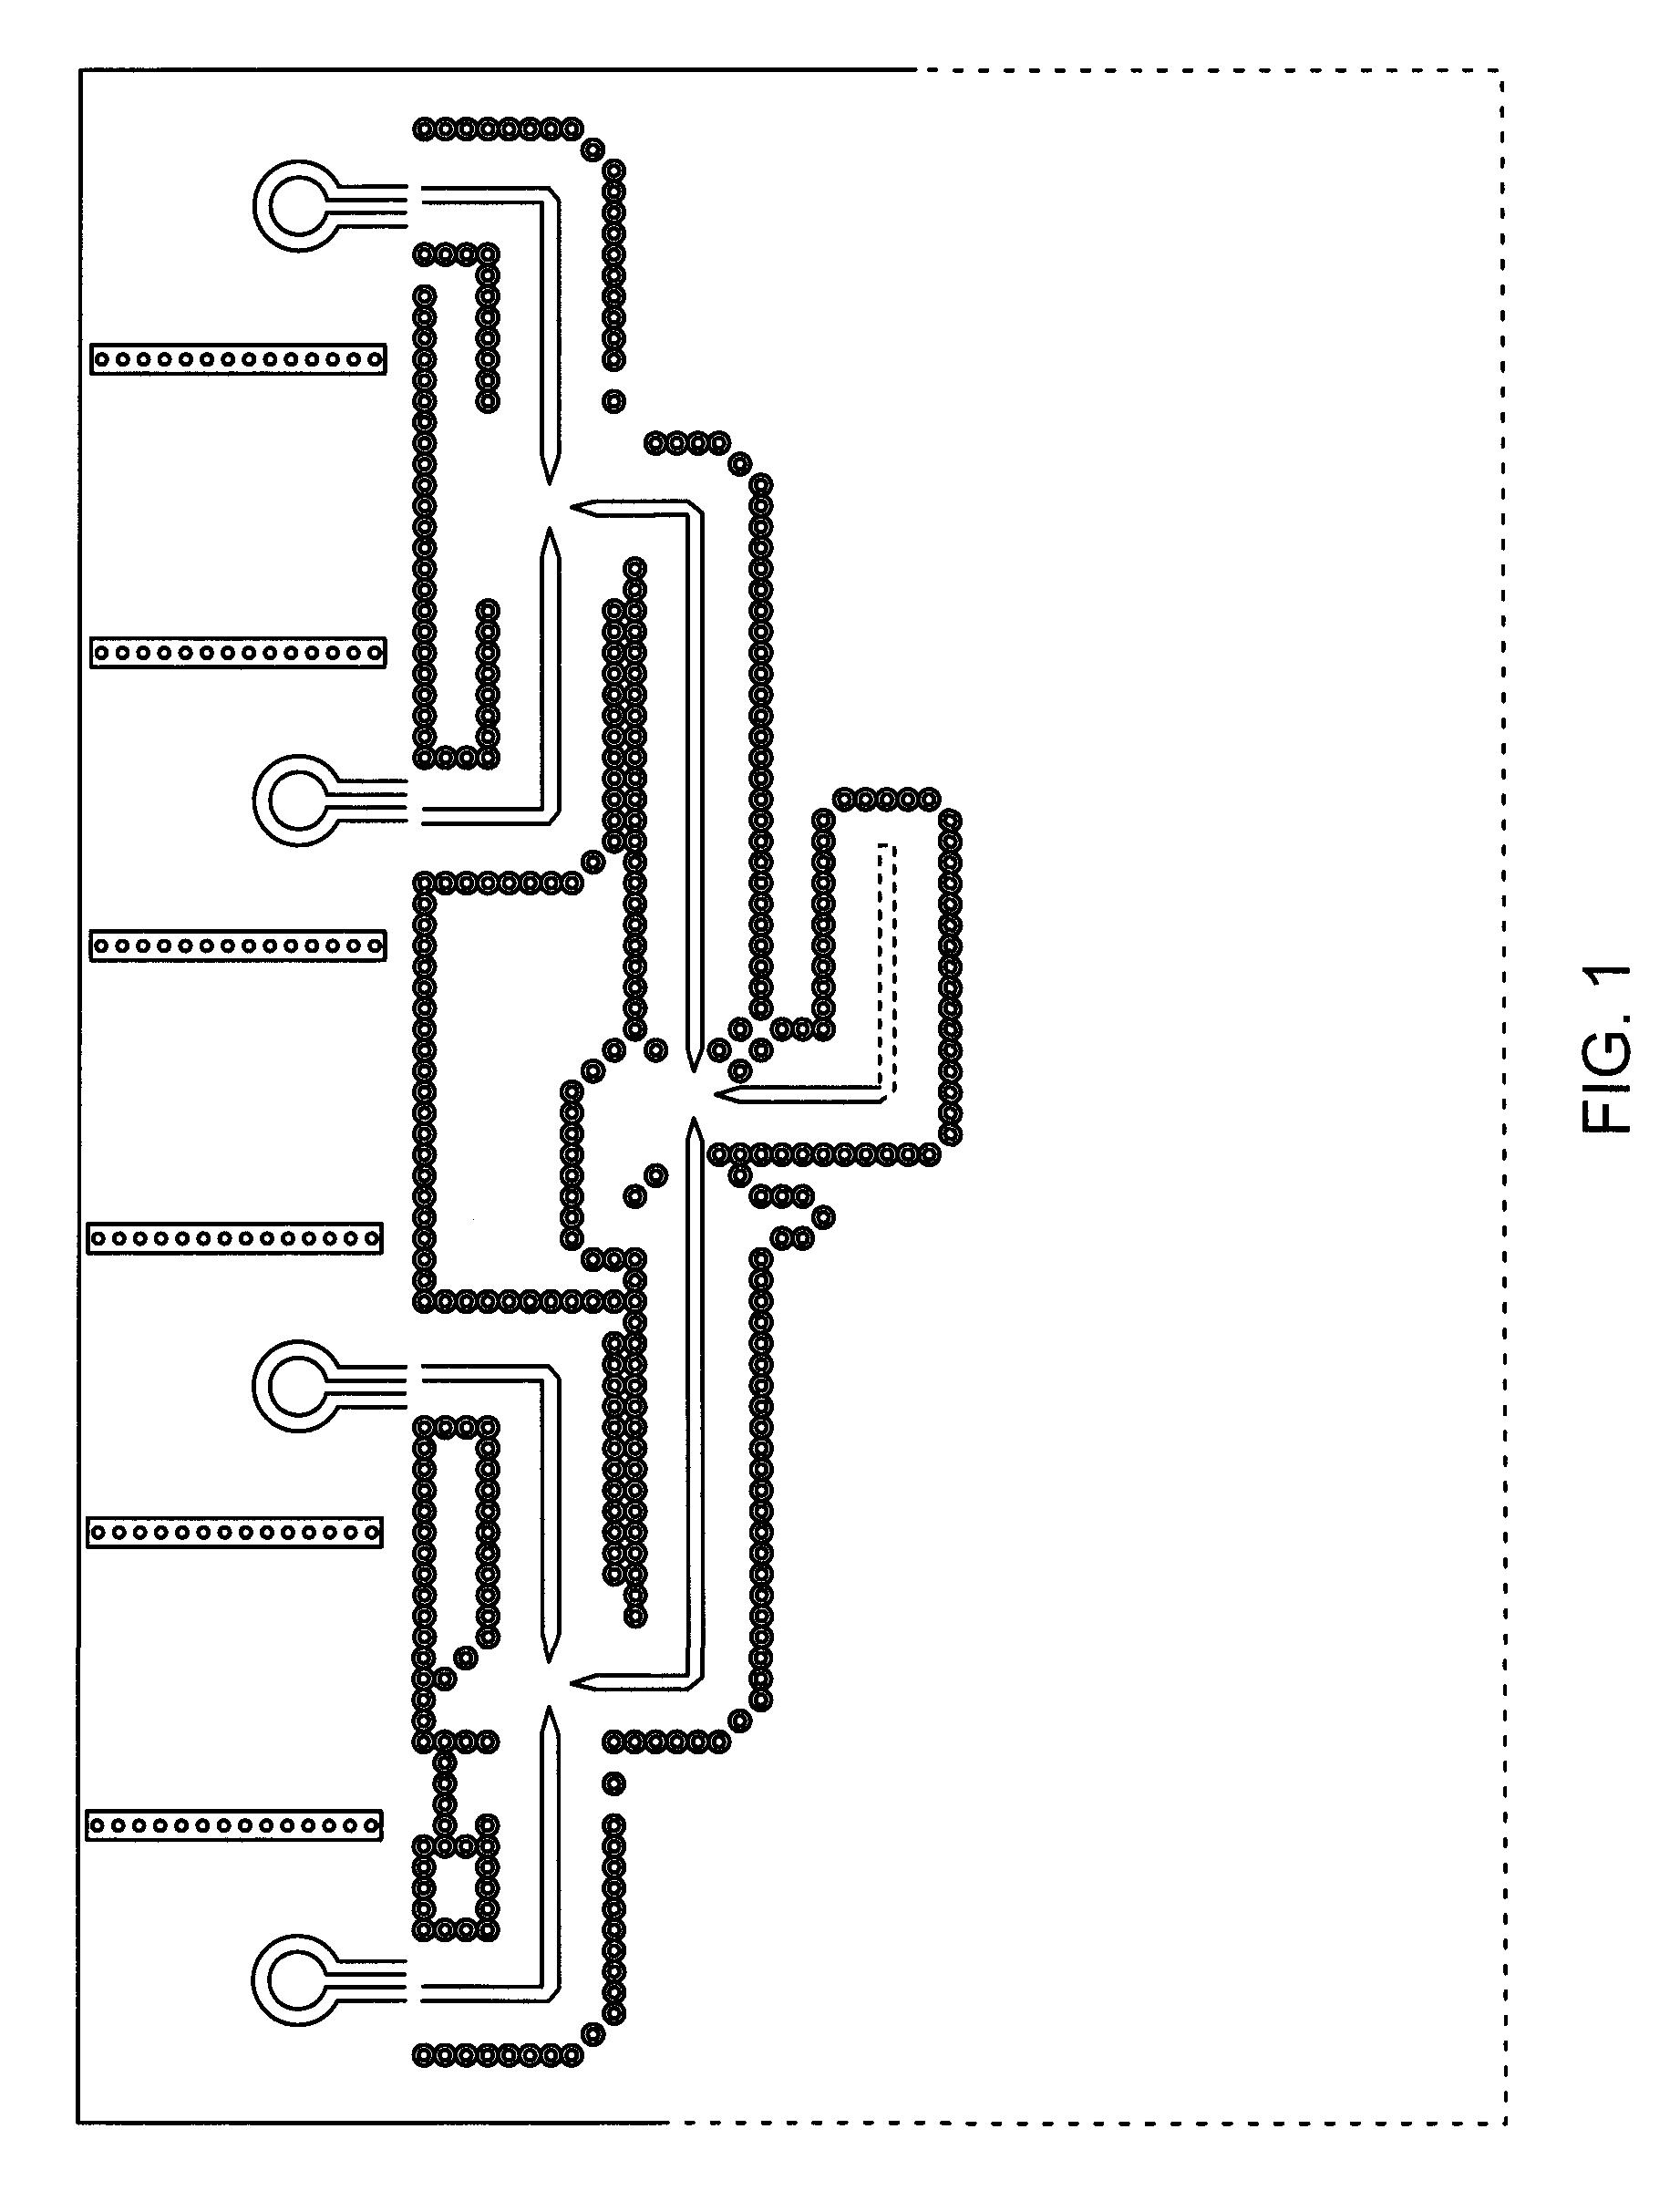 patent usd599308 - rfid antenna circuit board